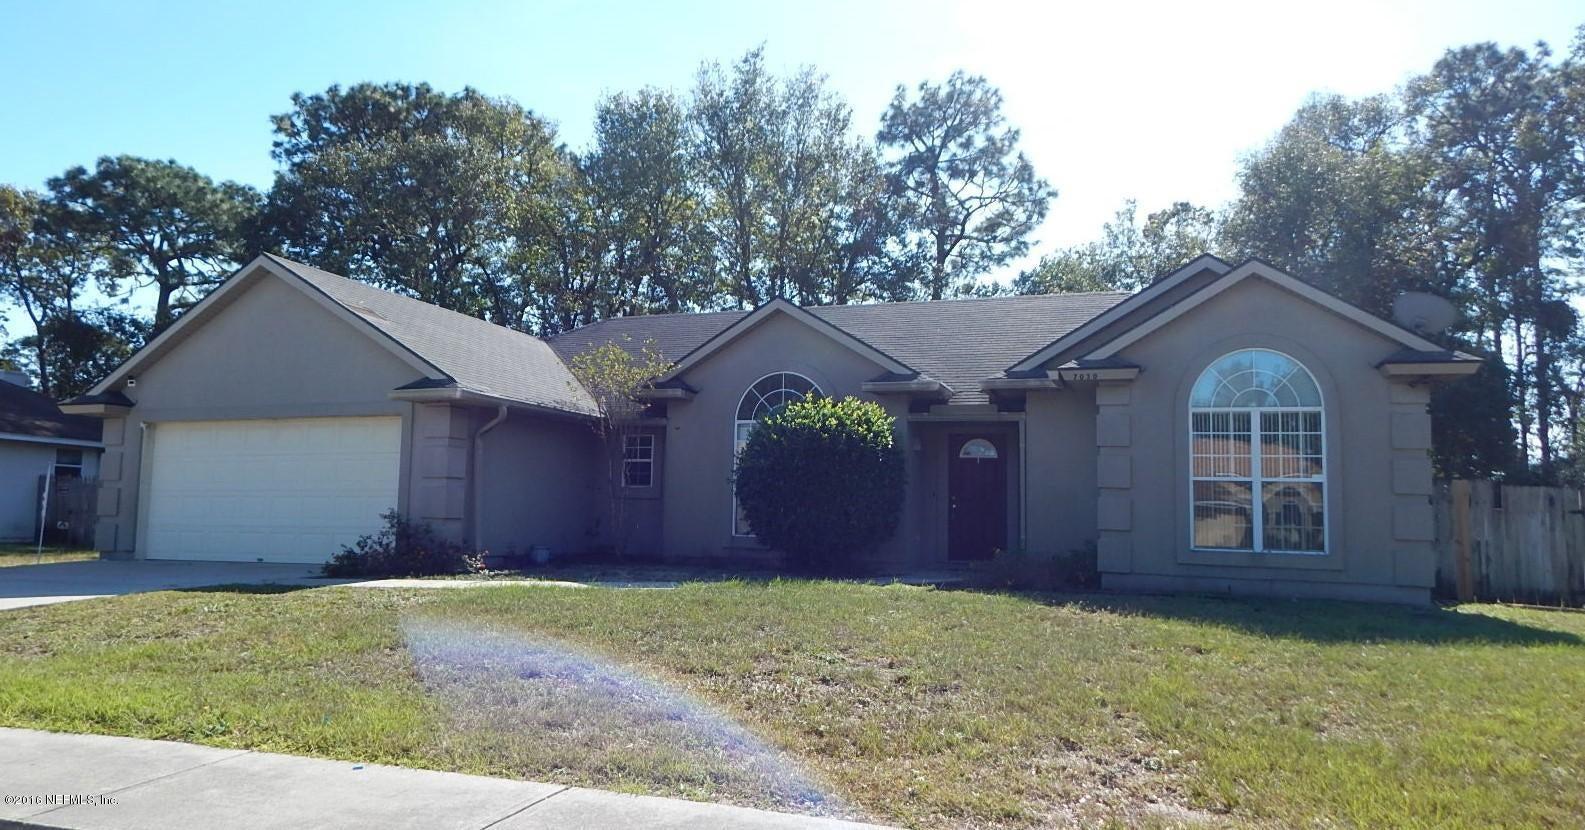 7030 MILLCREST,JACKSONVILLE,FLORIDA 32277,3 Bedrooms Bedrooms,2 BathroomsBathrooms,Residential - single family,MILLCREST,854898